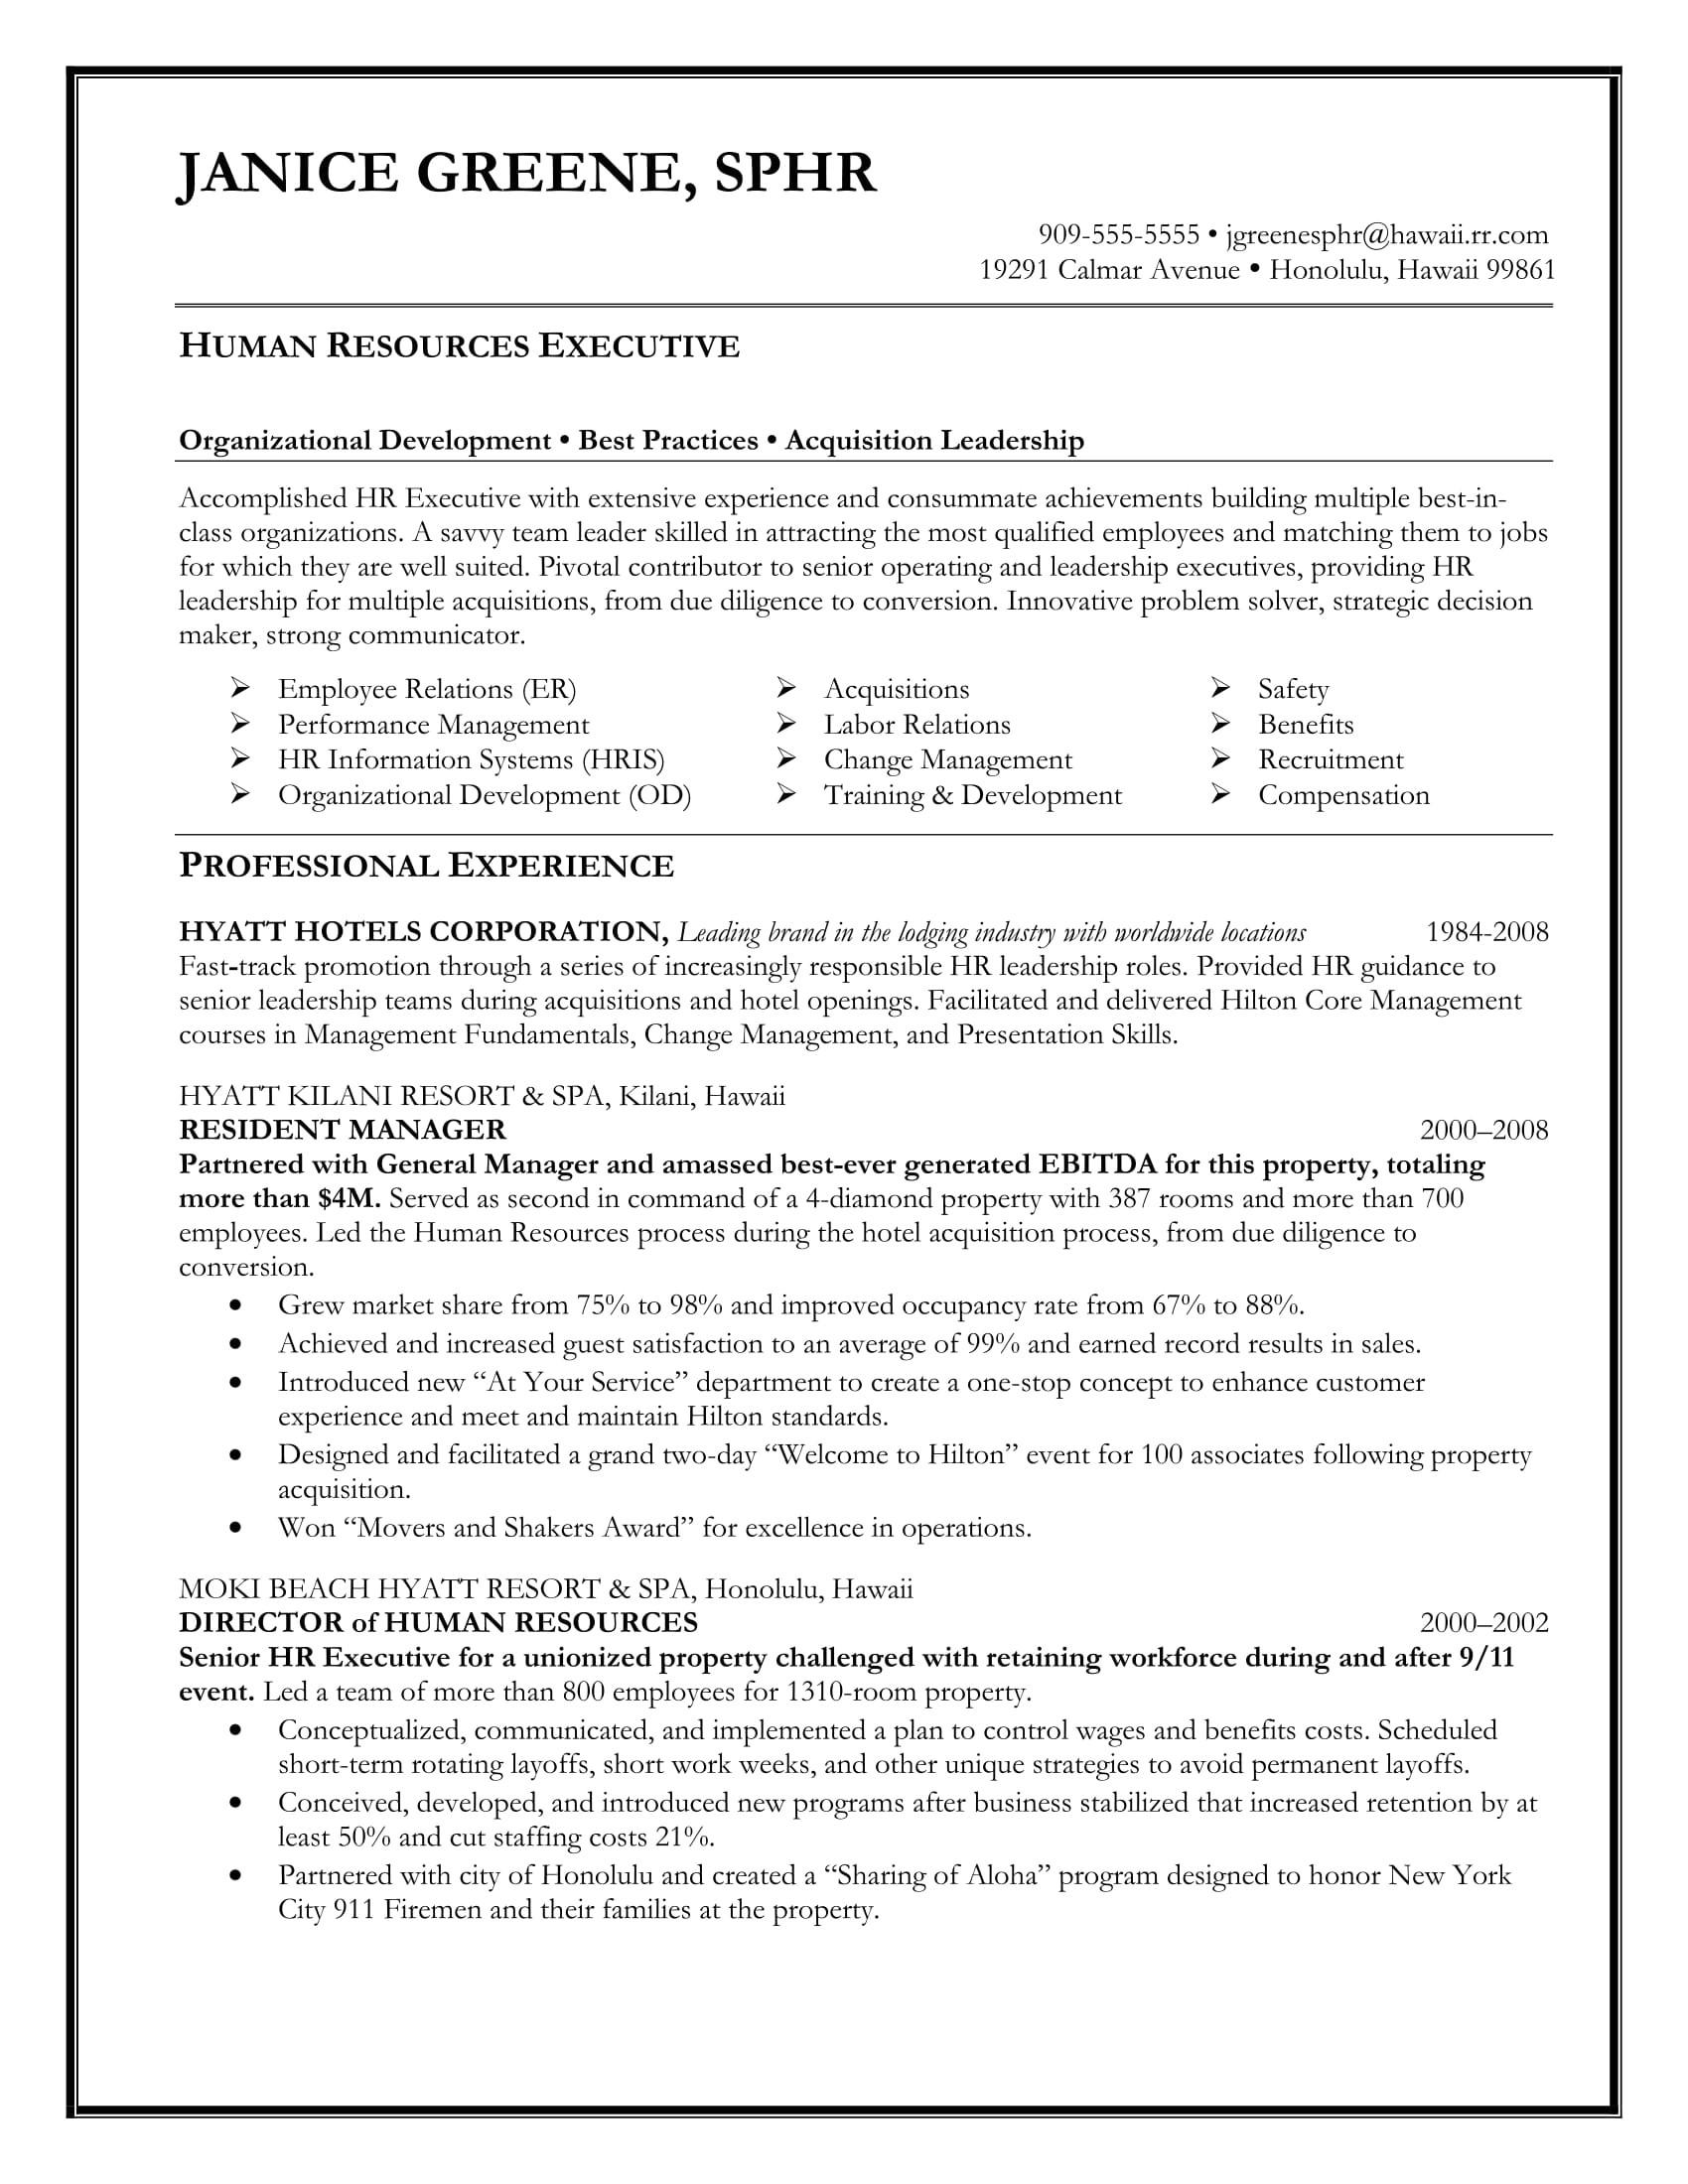 Free Executive Resume Templates 24 Best Sample Executive Resume Templates Wisestep